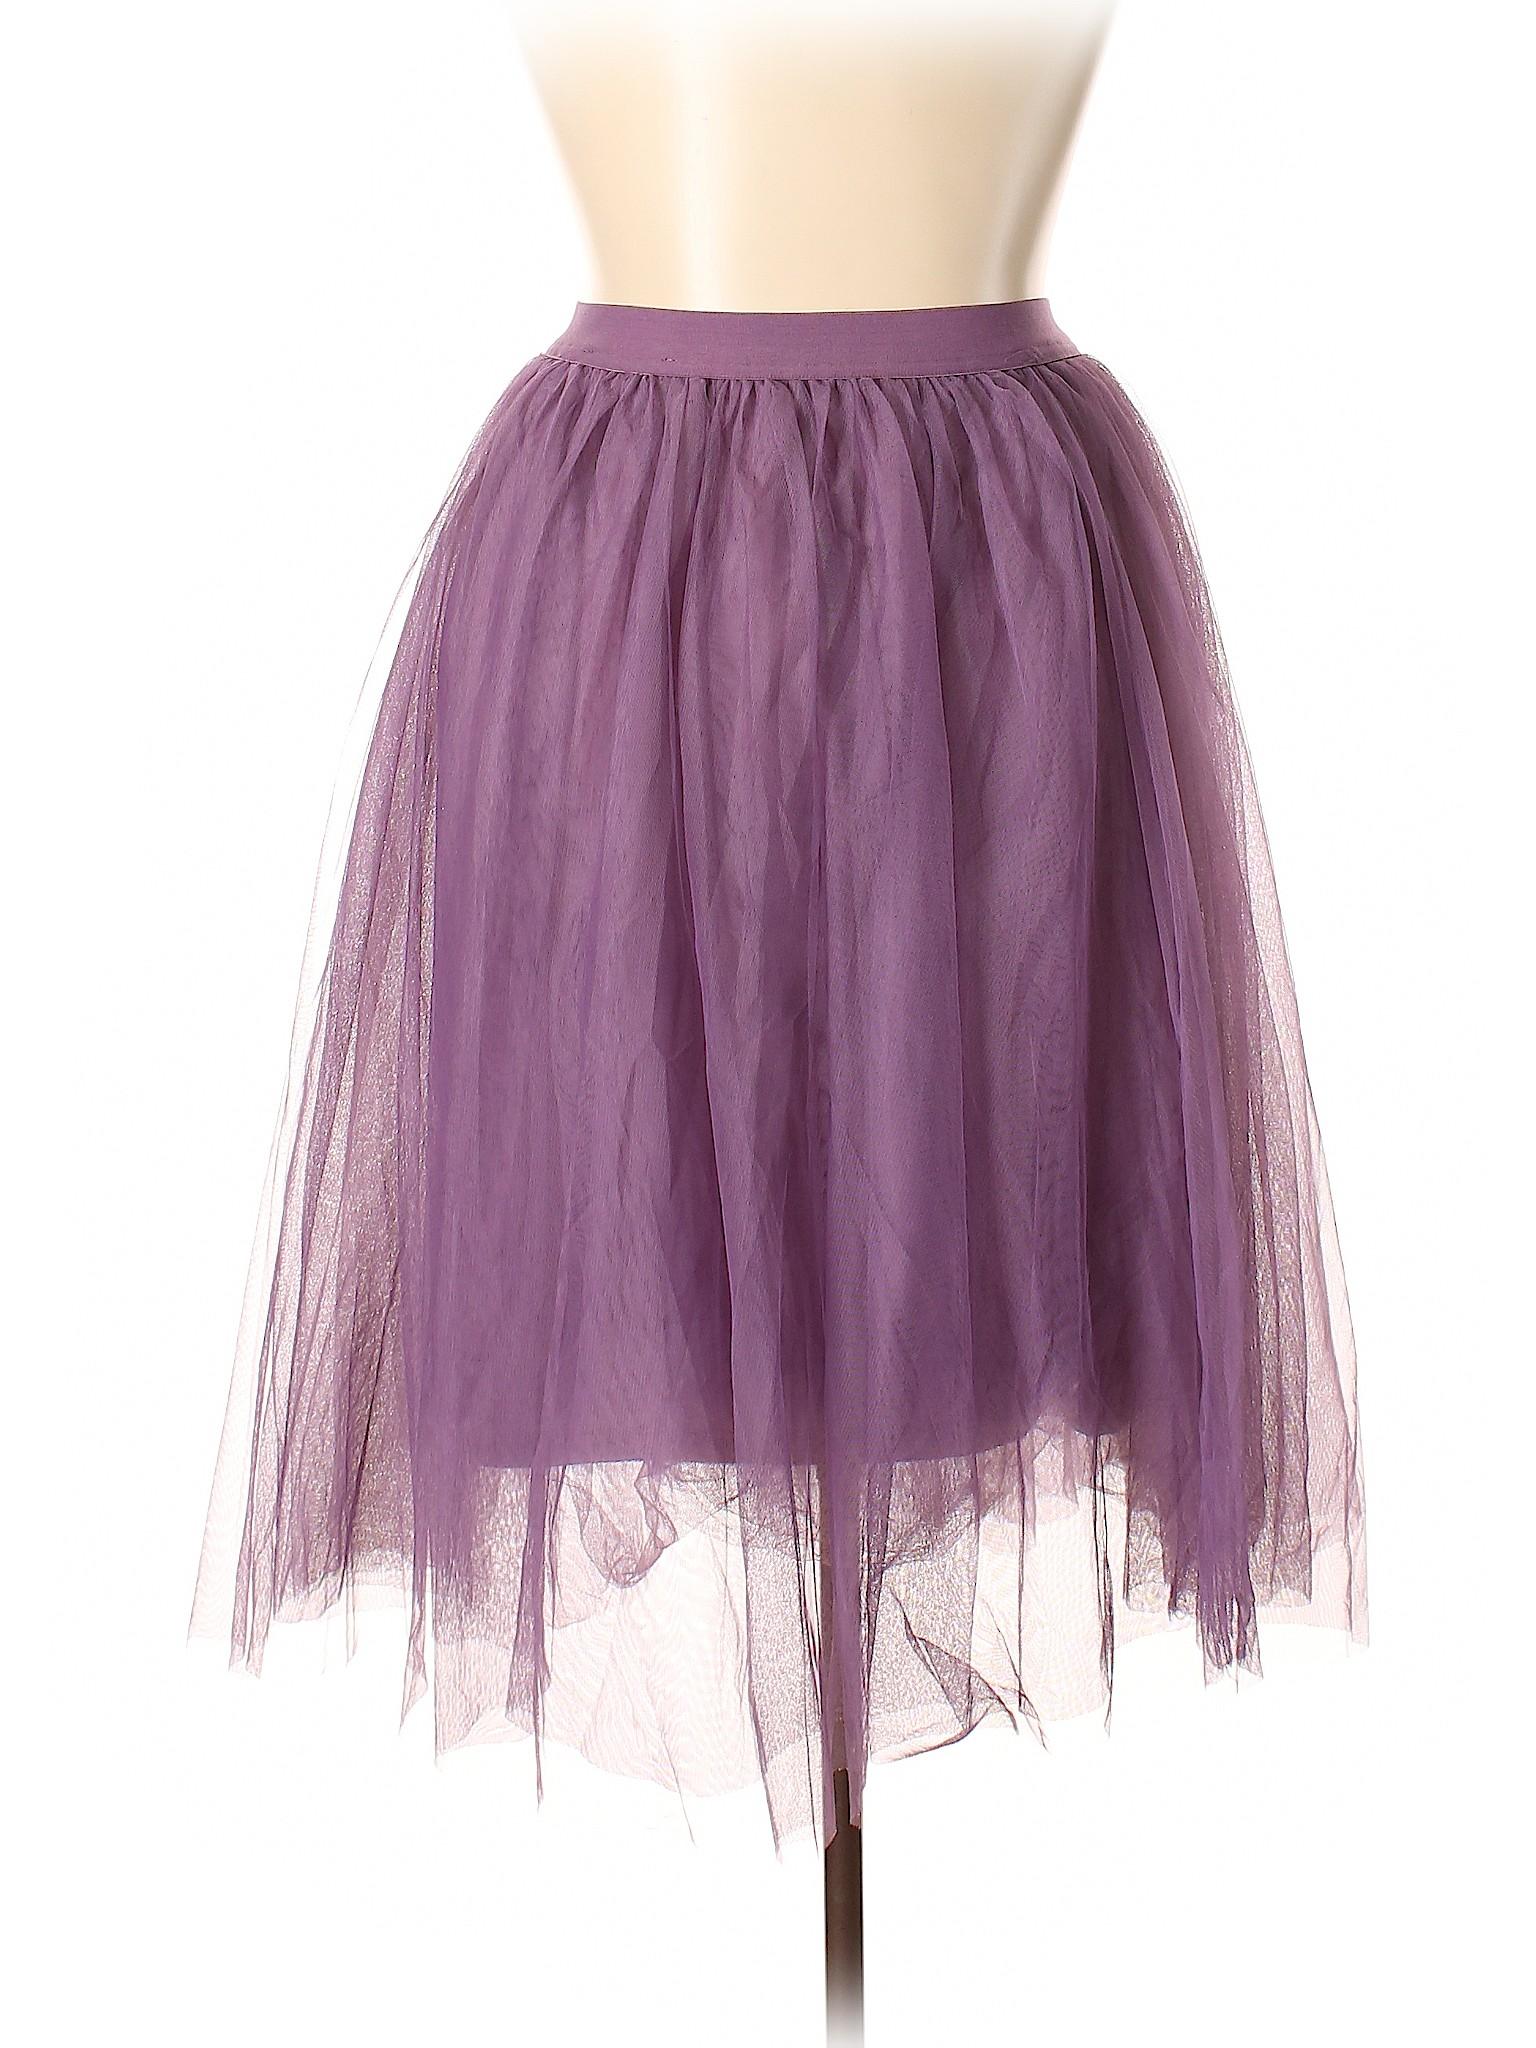 Boutique Haute Monde leisure Formal Skirt wR8RSTYx